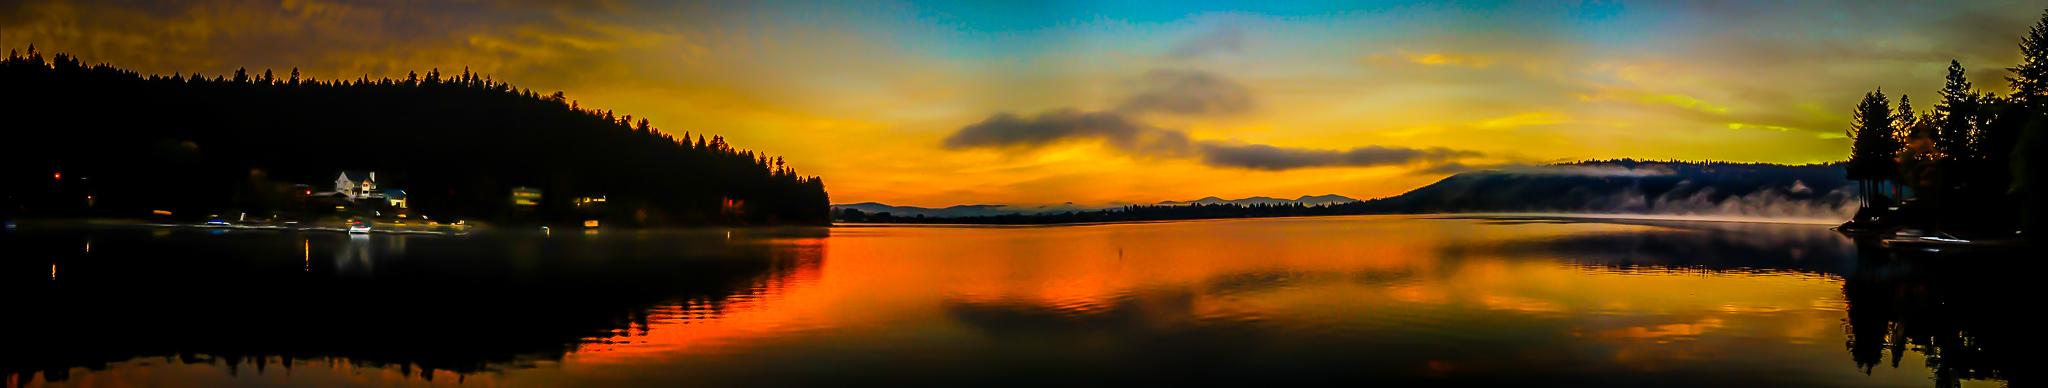 iPhone Panorama, Dreamwood Bay, Liberty Lake, Washington